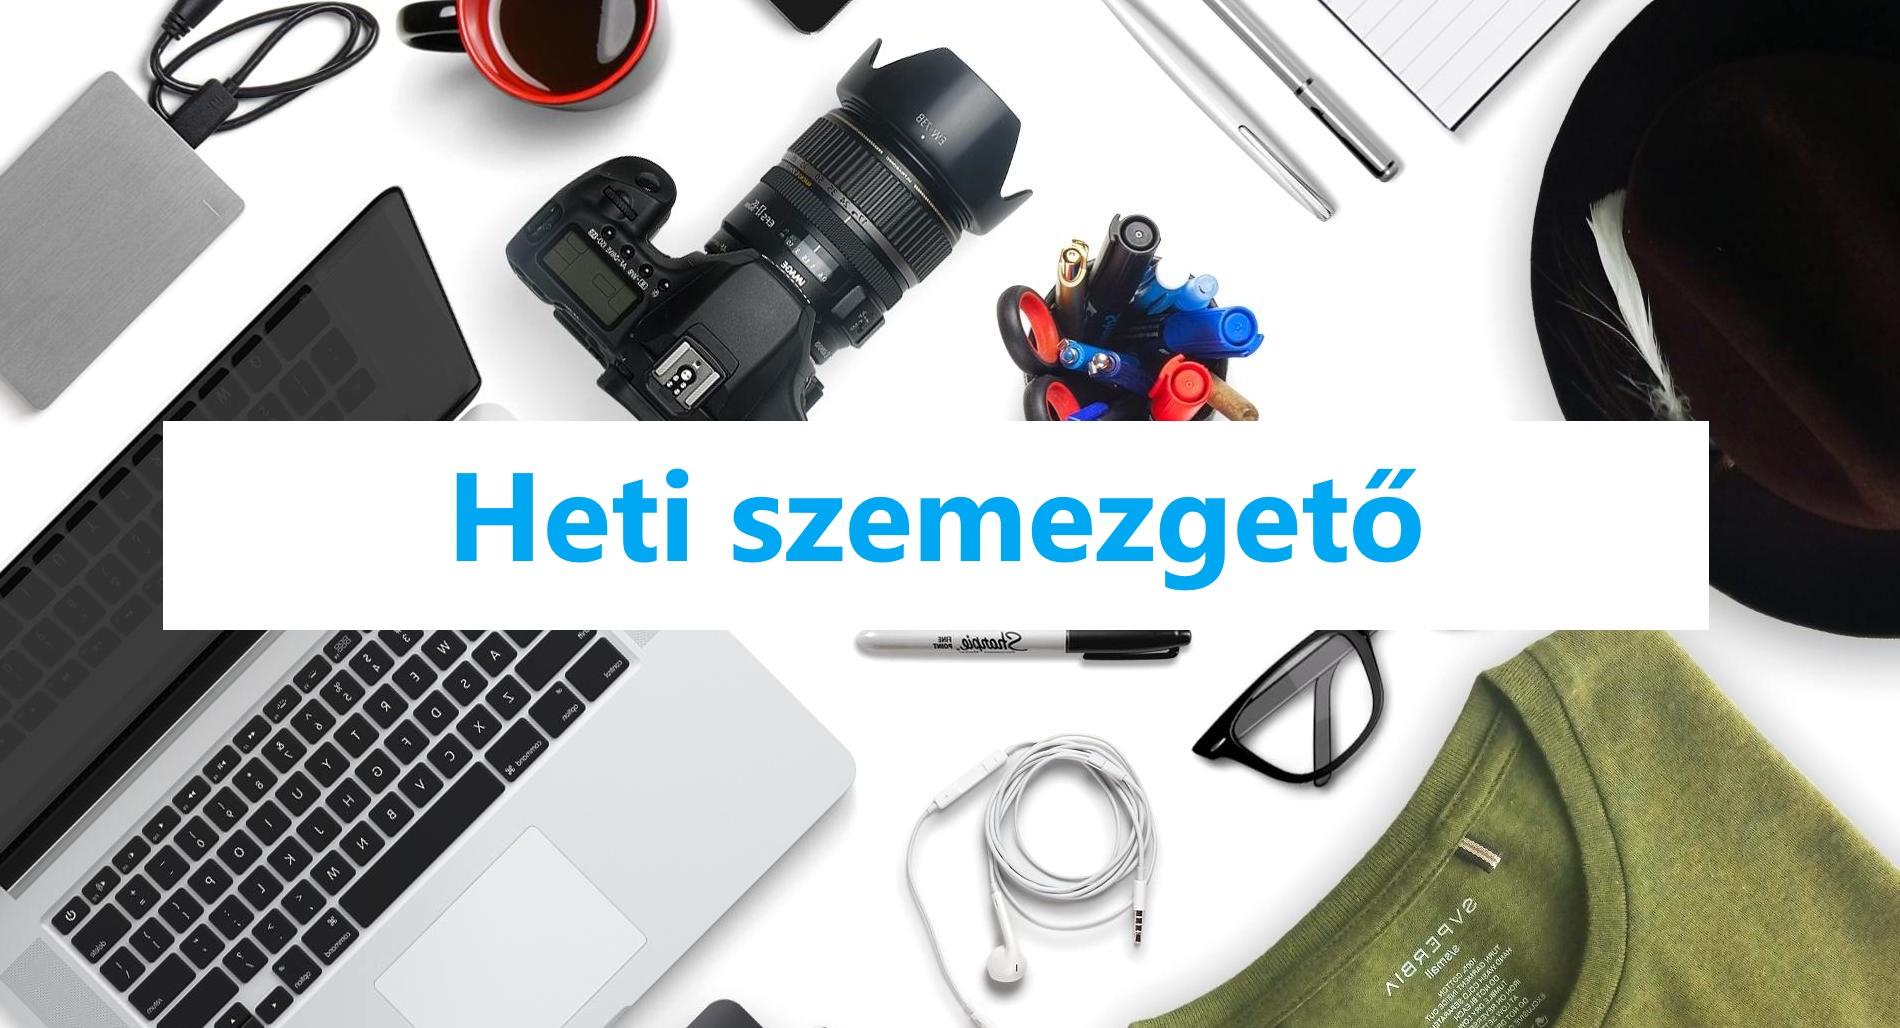 heti_szemezgeto_uj_59.jpg